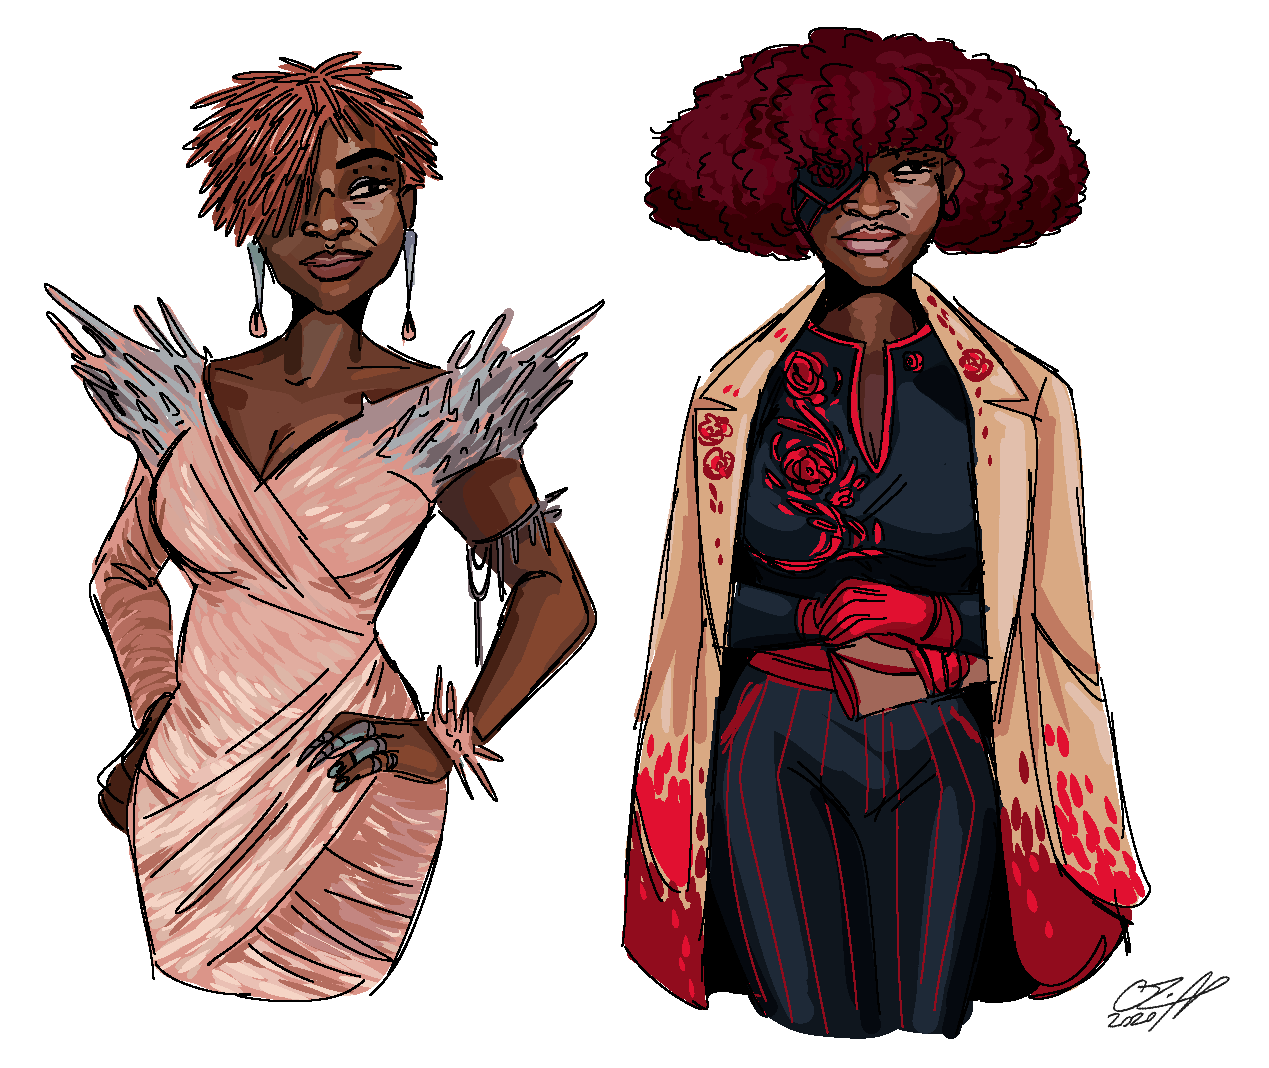 Pin by big dan on Black art | Art fundraiser, Black girl